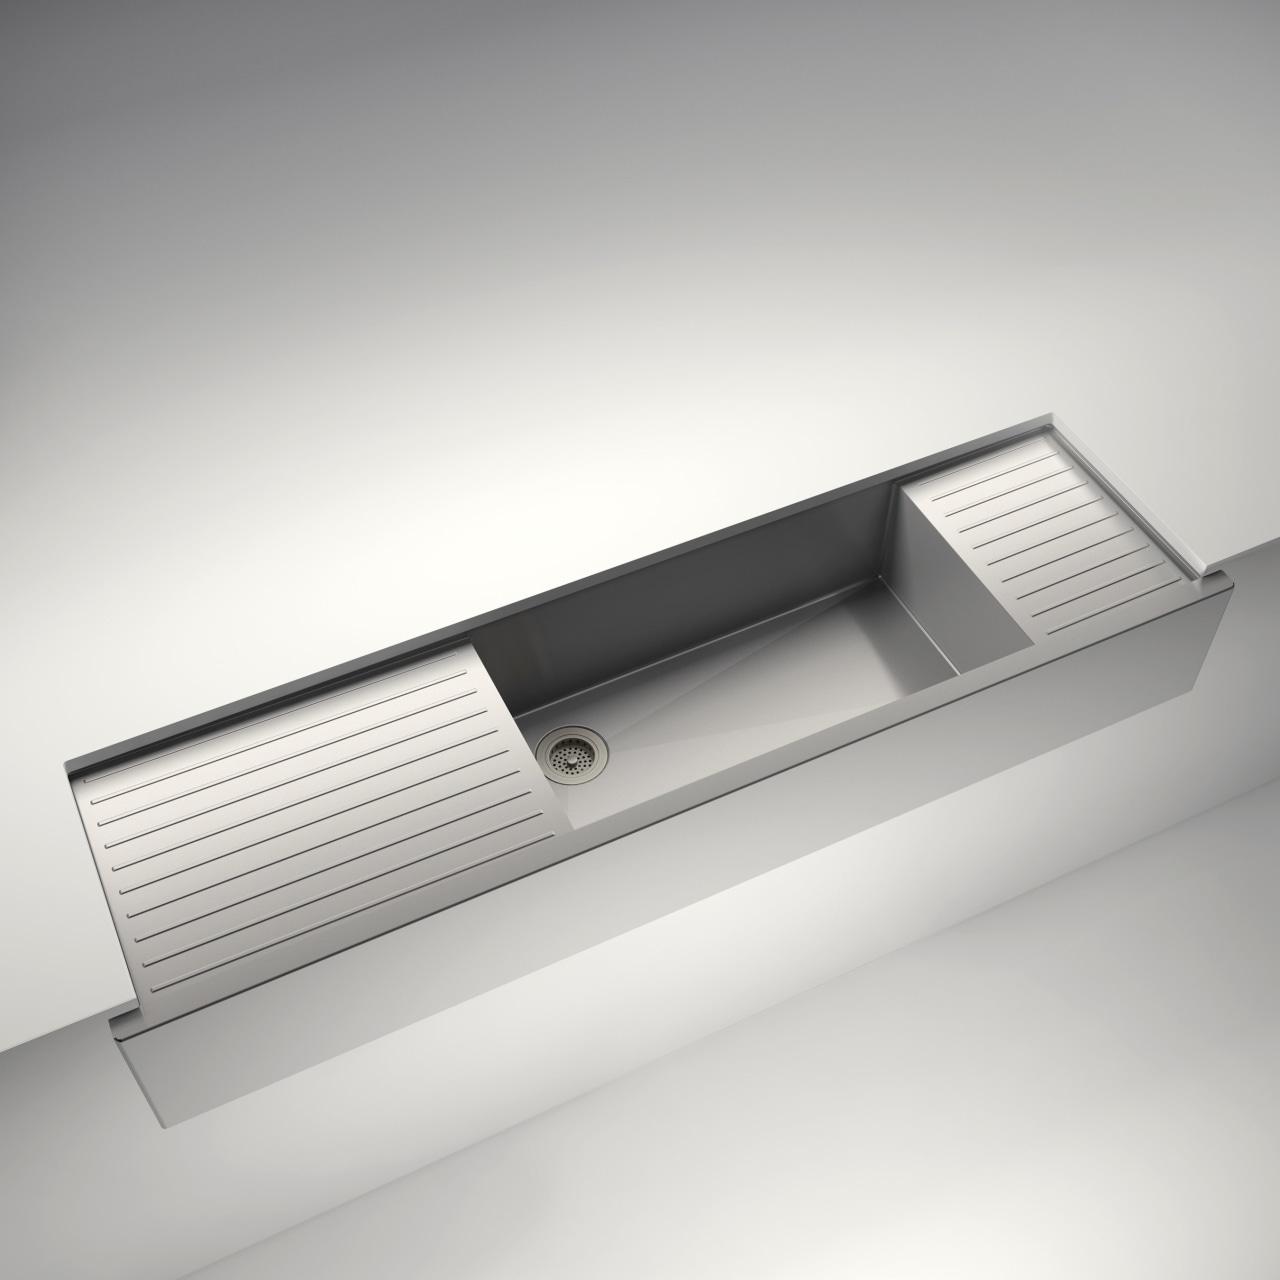 Julien à la Carte customizable sink light, lighting, product, product design, white